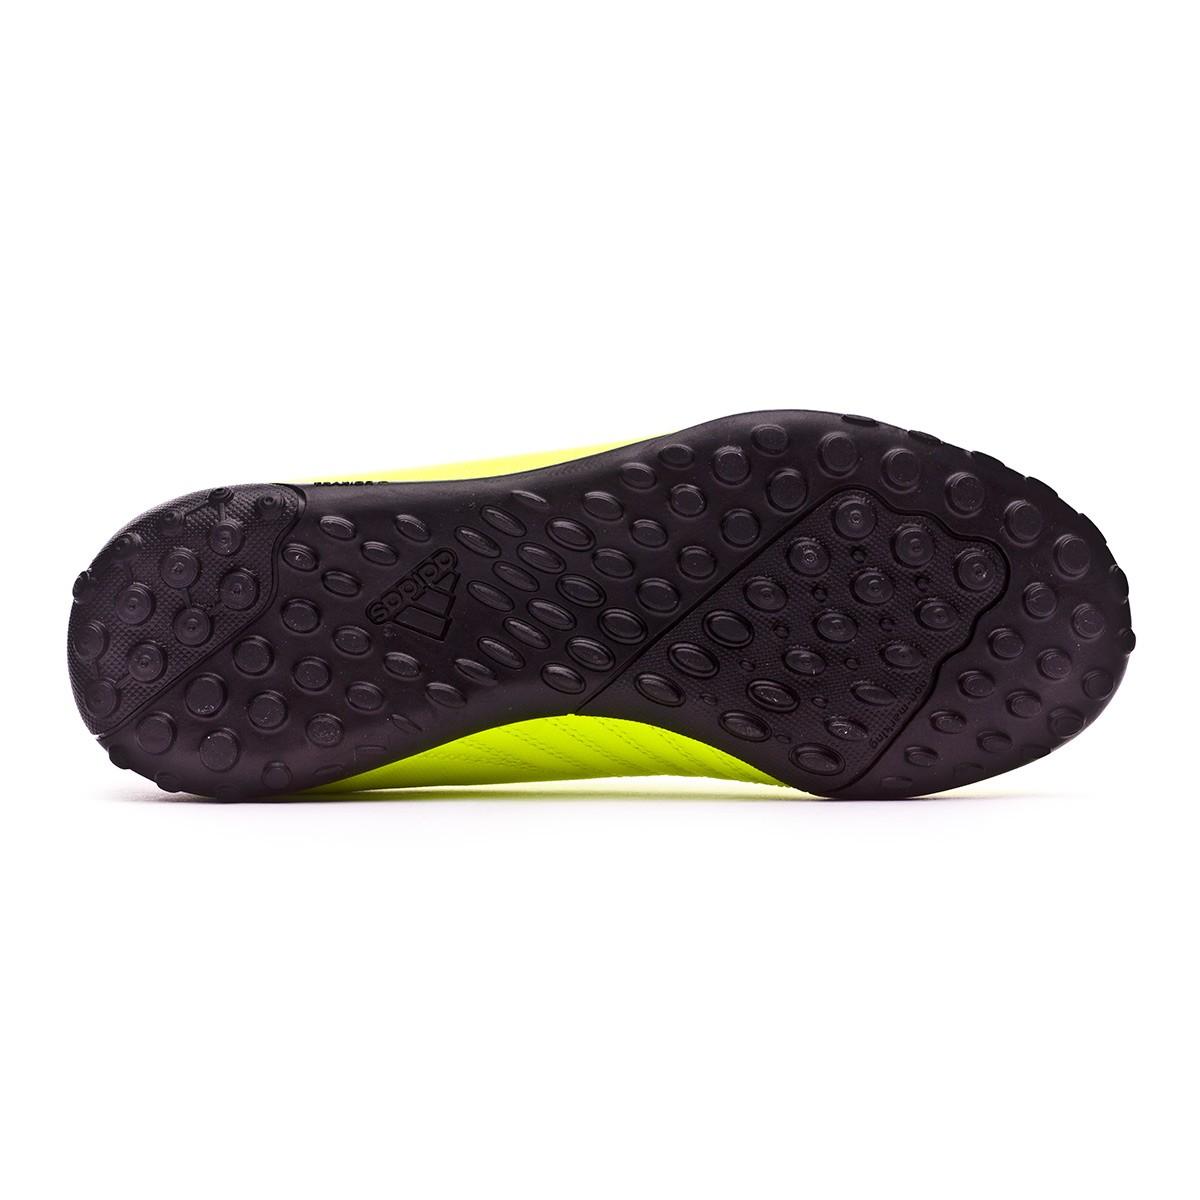 cff4b7f5783af Football Boot adidas Kids X Tango 18.4 Turf Solar yellow-Core black-Solar  yellow - Leaked soccer